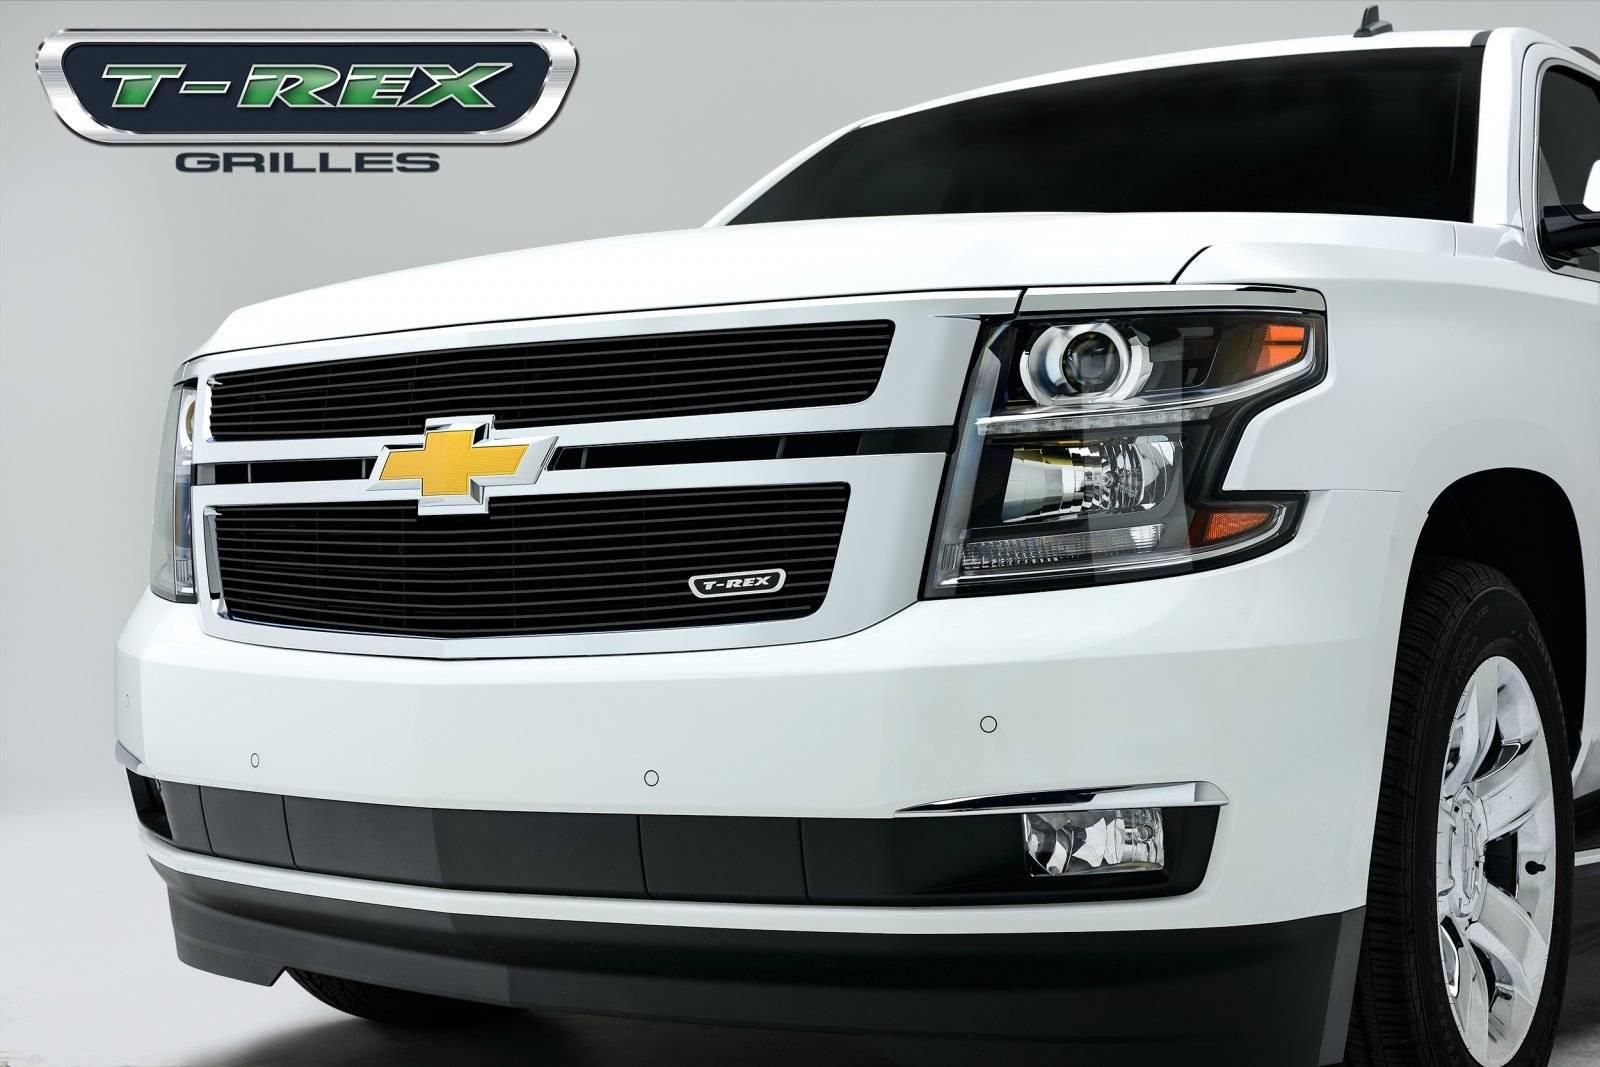 T-REX Grilles - Chevrolet Suburban, Tahoe Billet Grille Overlay/Bolt On - 2 Pc  - All Black - Pt # 21055B